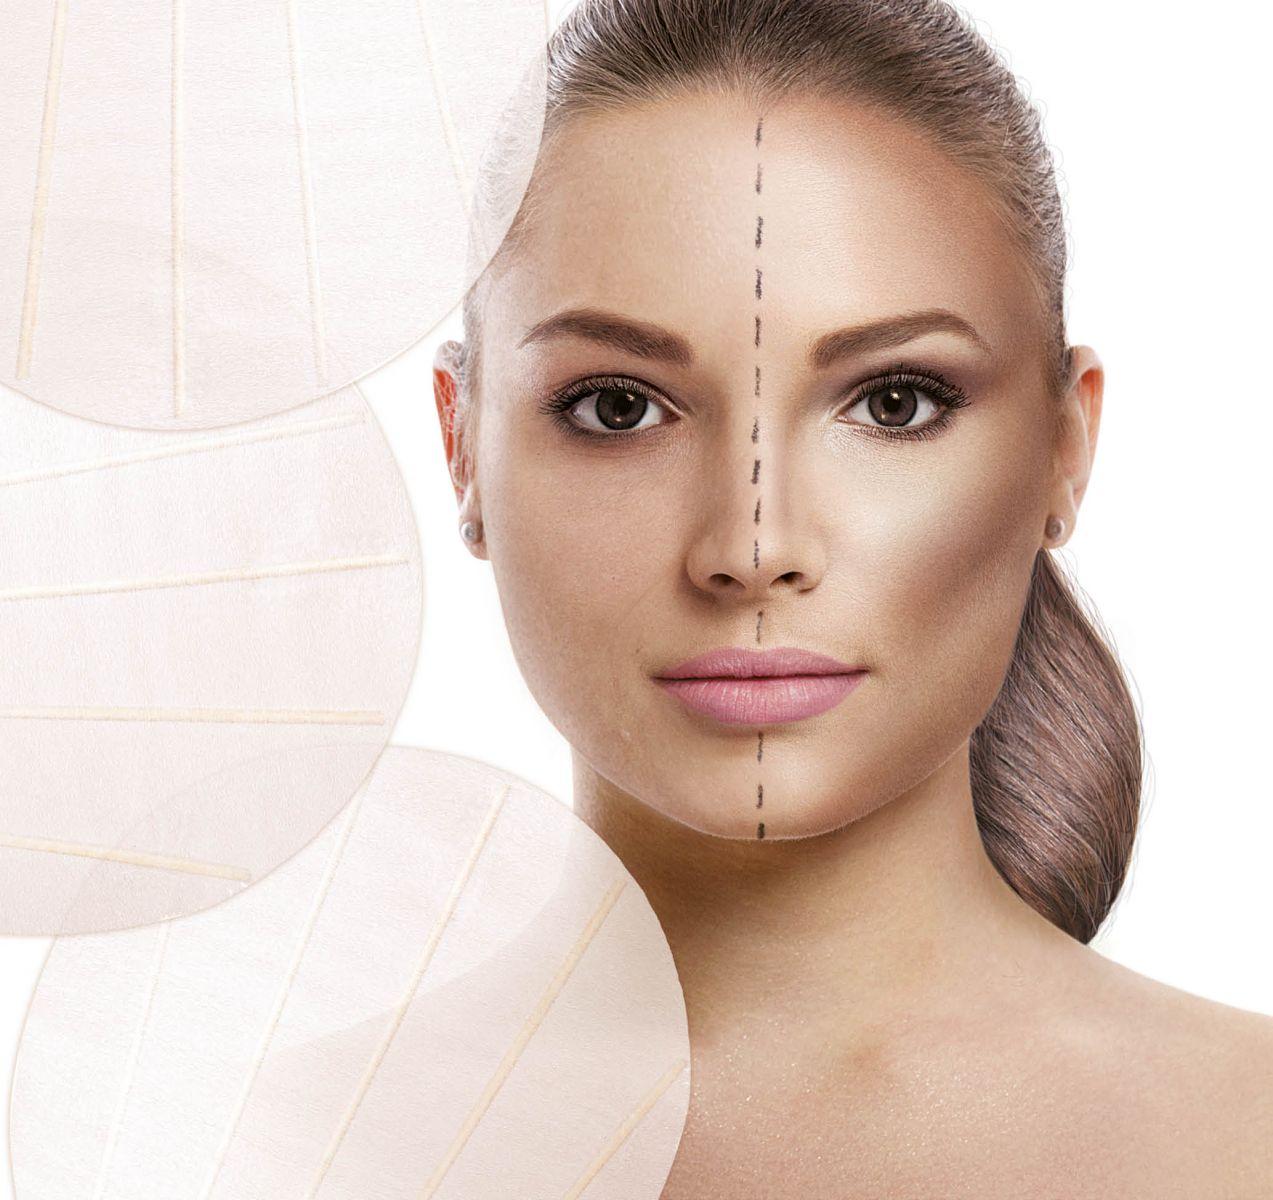 По контуру: новая коллекция для контуринга и стробинка The Art of Shaping от Make Up Factory